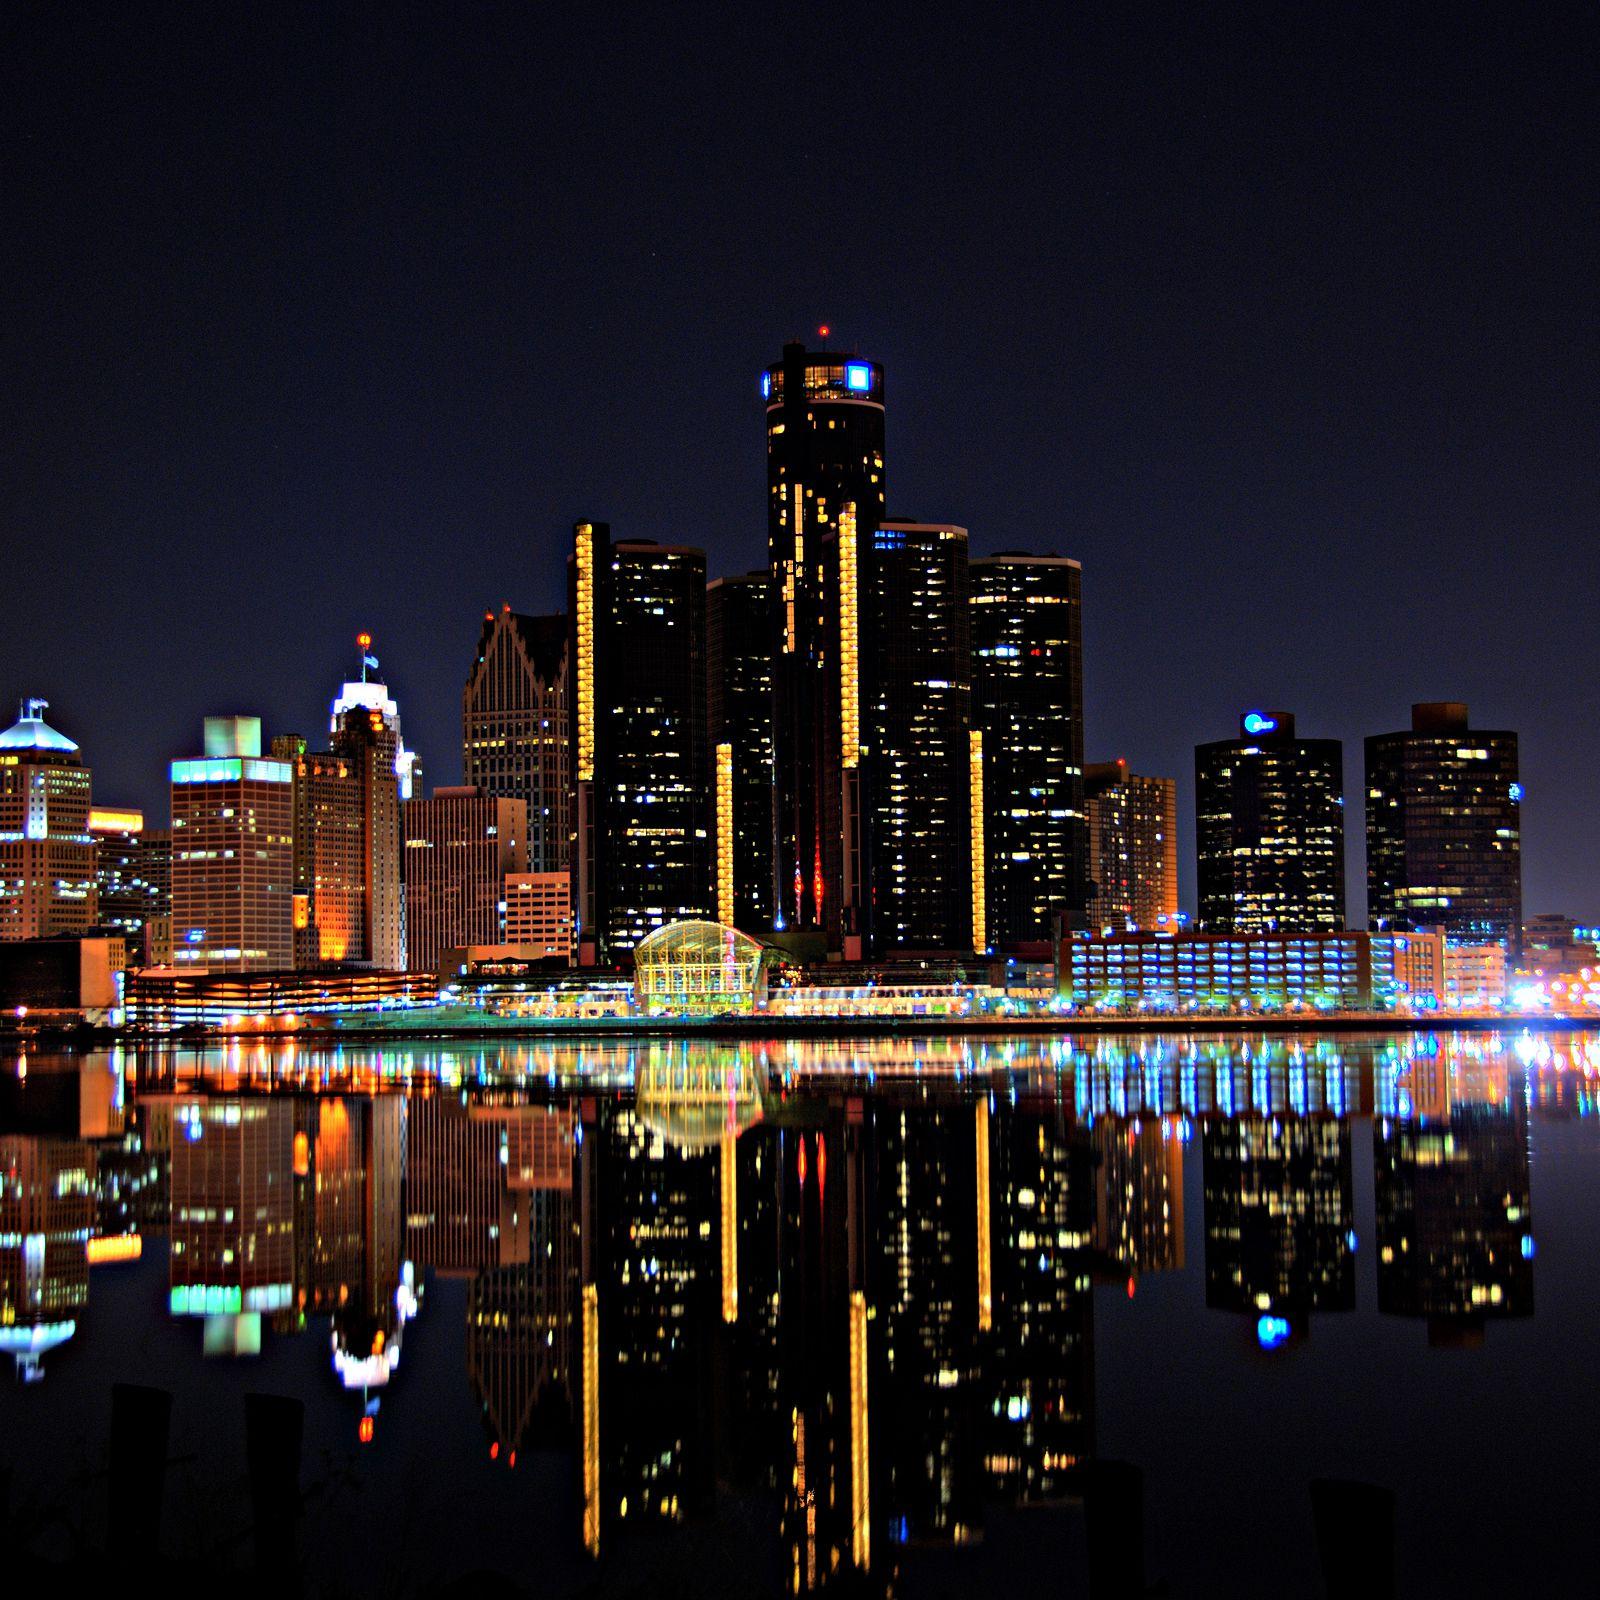 Nightlife in Detroit: Best Bars, Clubs, & More